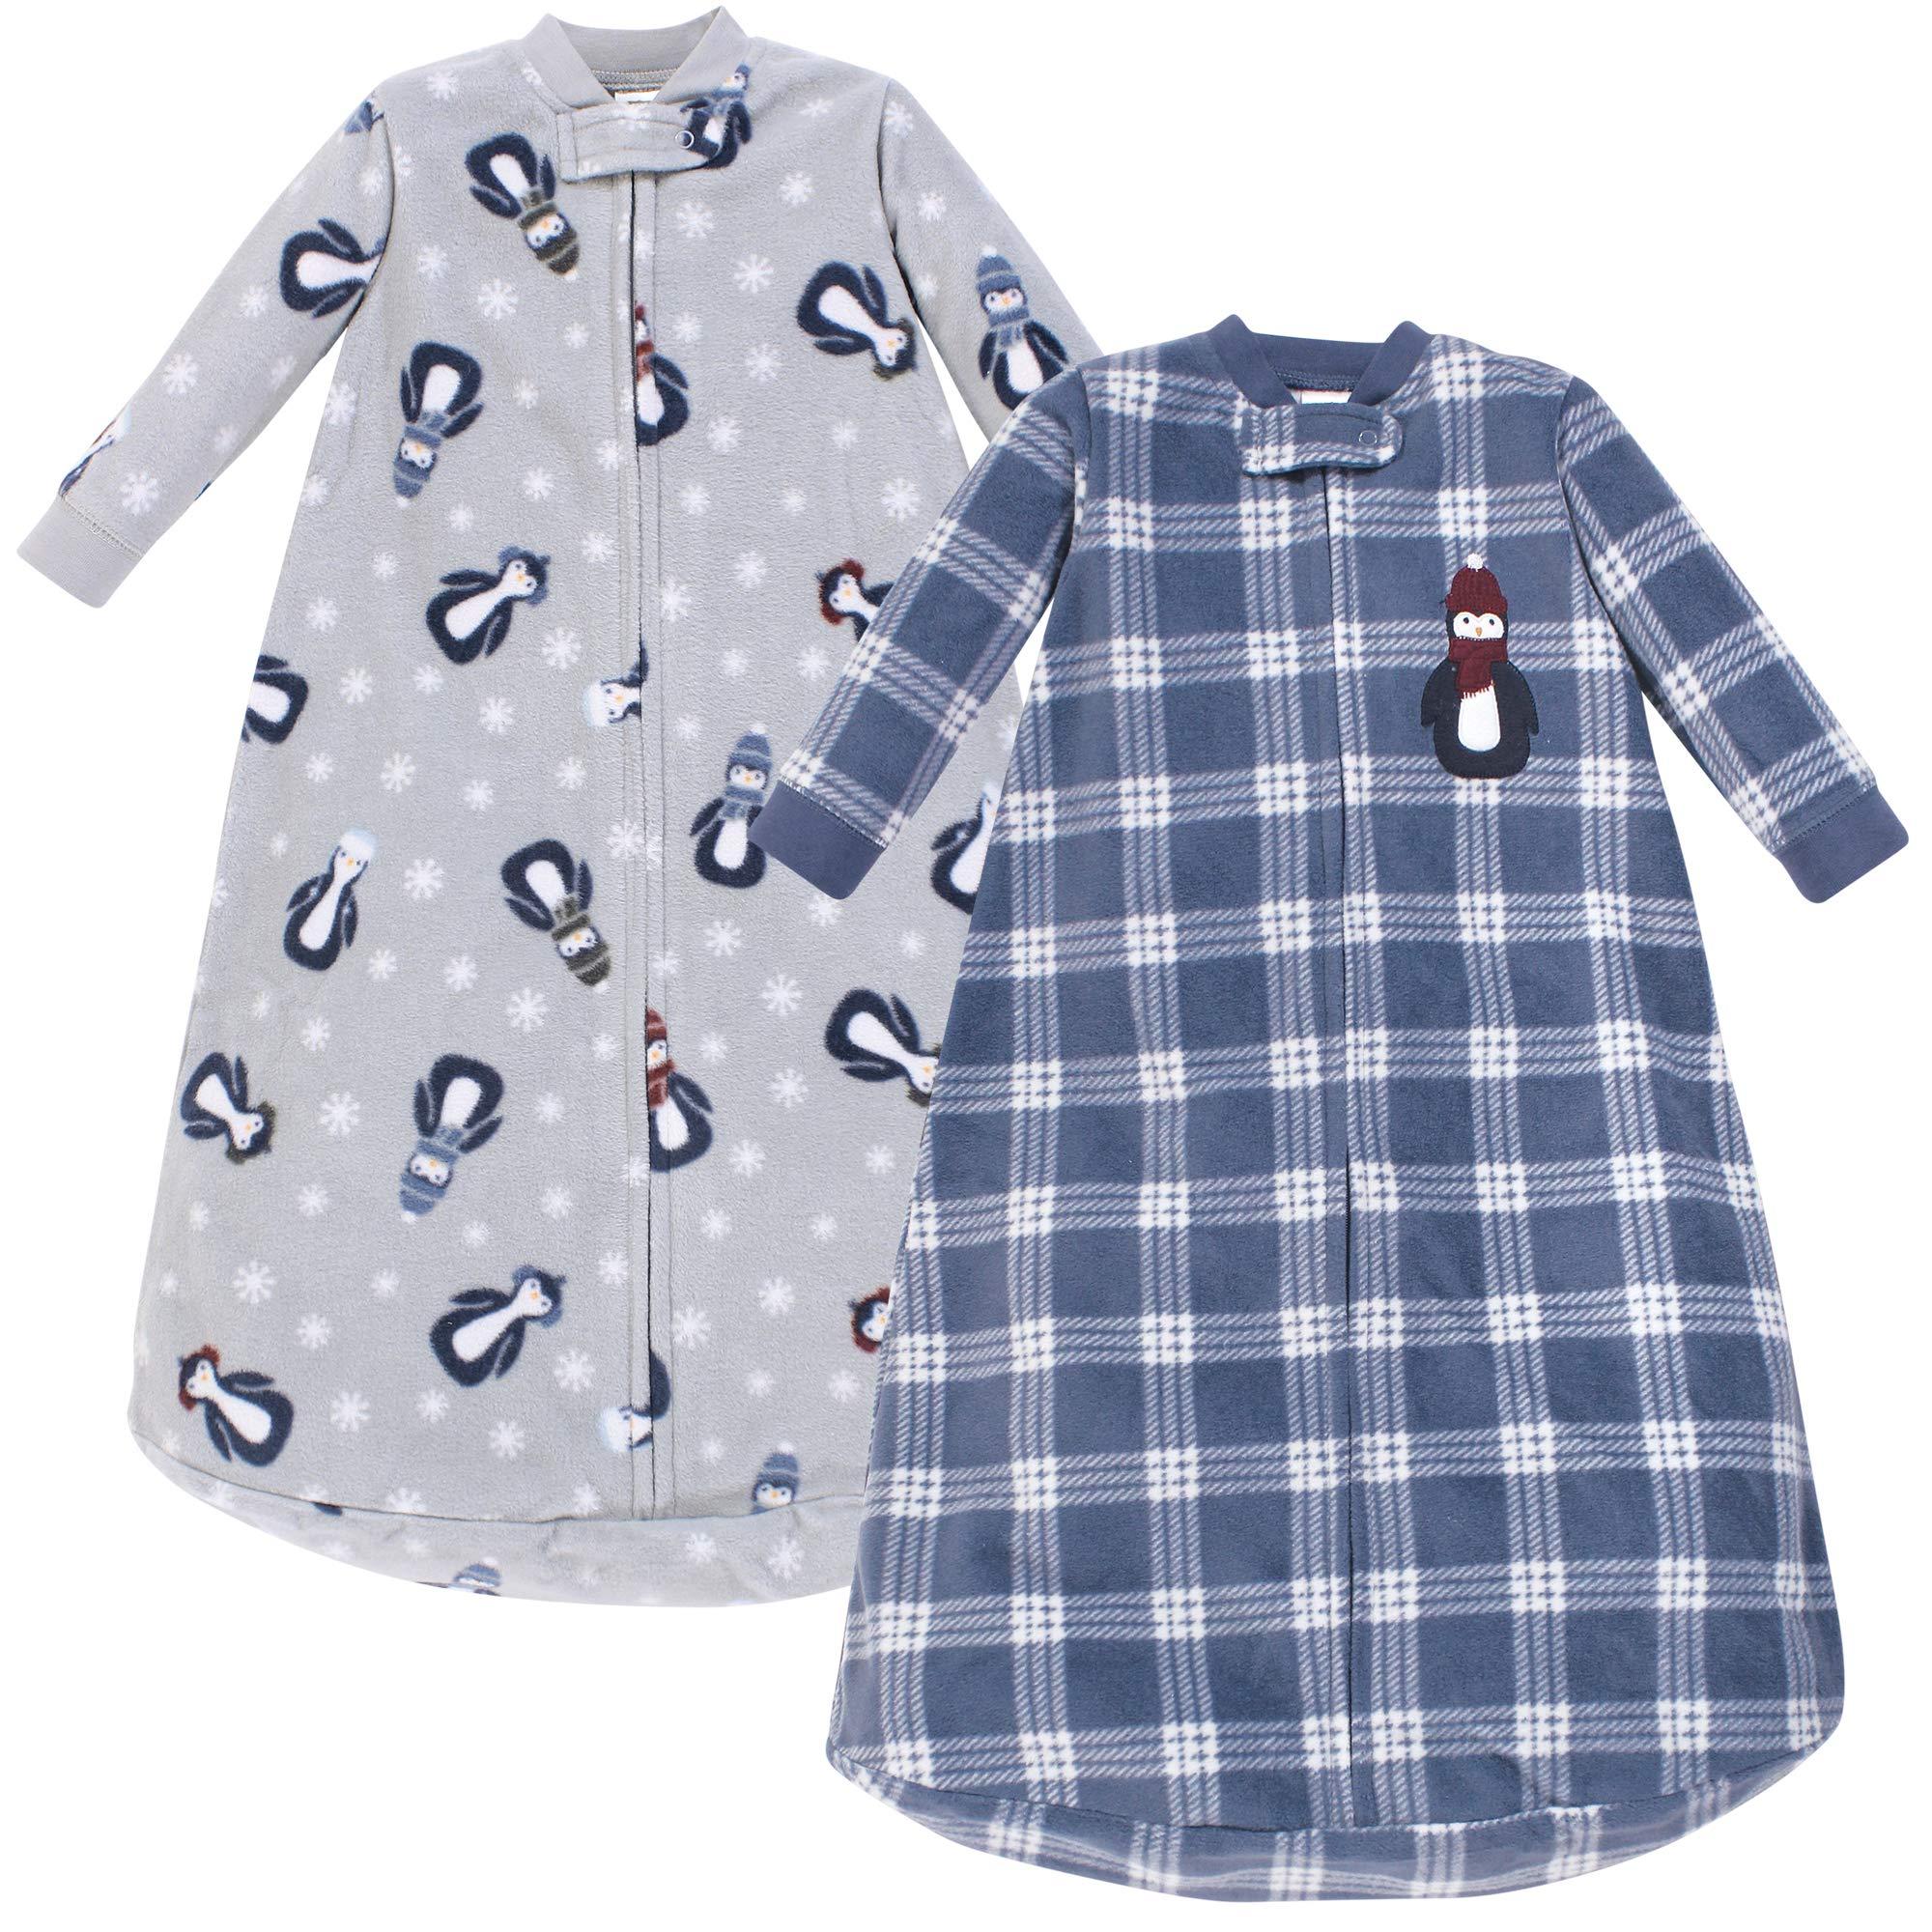 Hudson Baby Unisex Baby Long-Sleeve Fleece Sleeping Bag, Blue Penguin, 0-9 Months